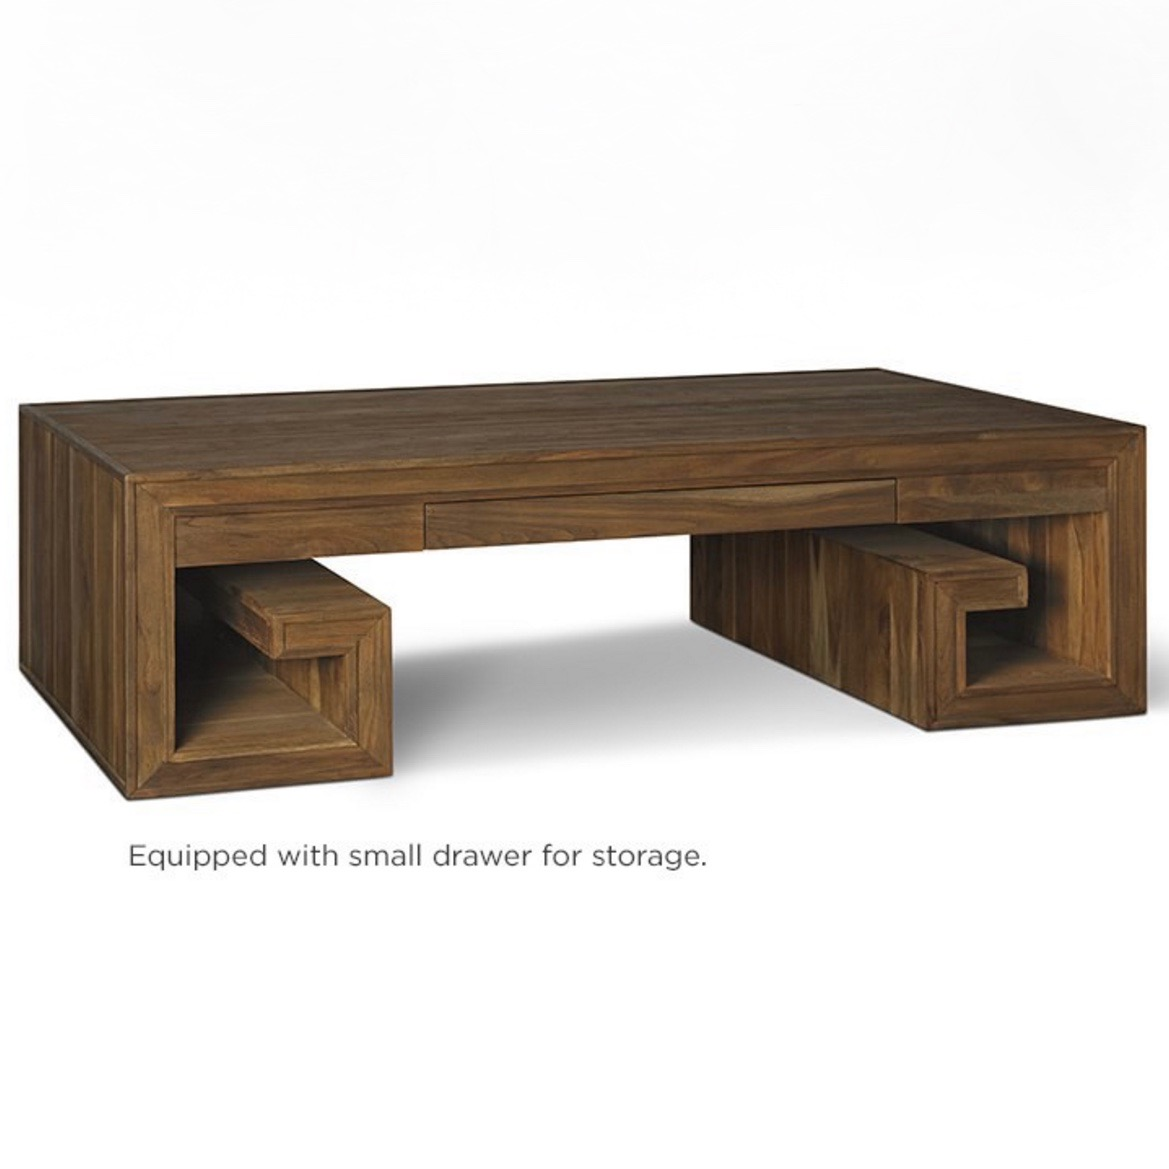 Crawford Greek Key Coffee Table Newport Coast Interior Design